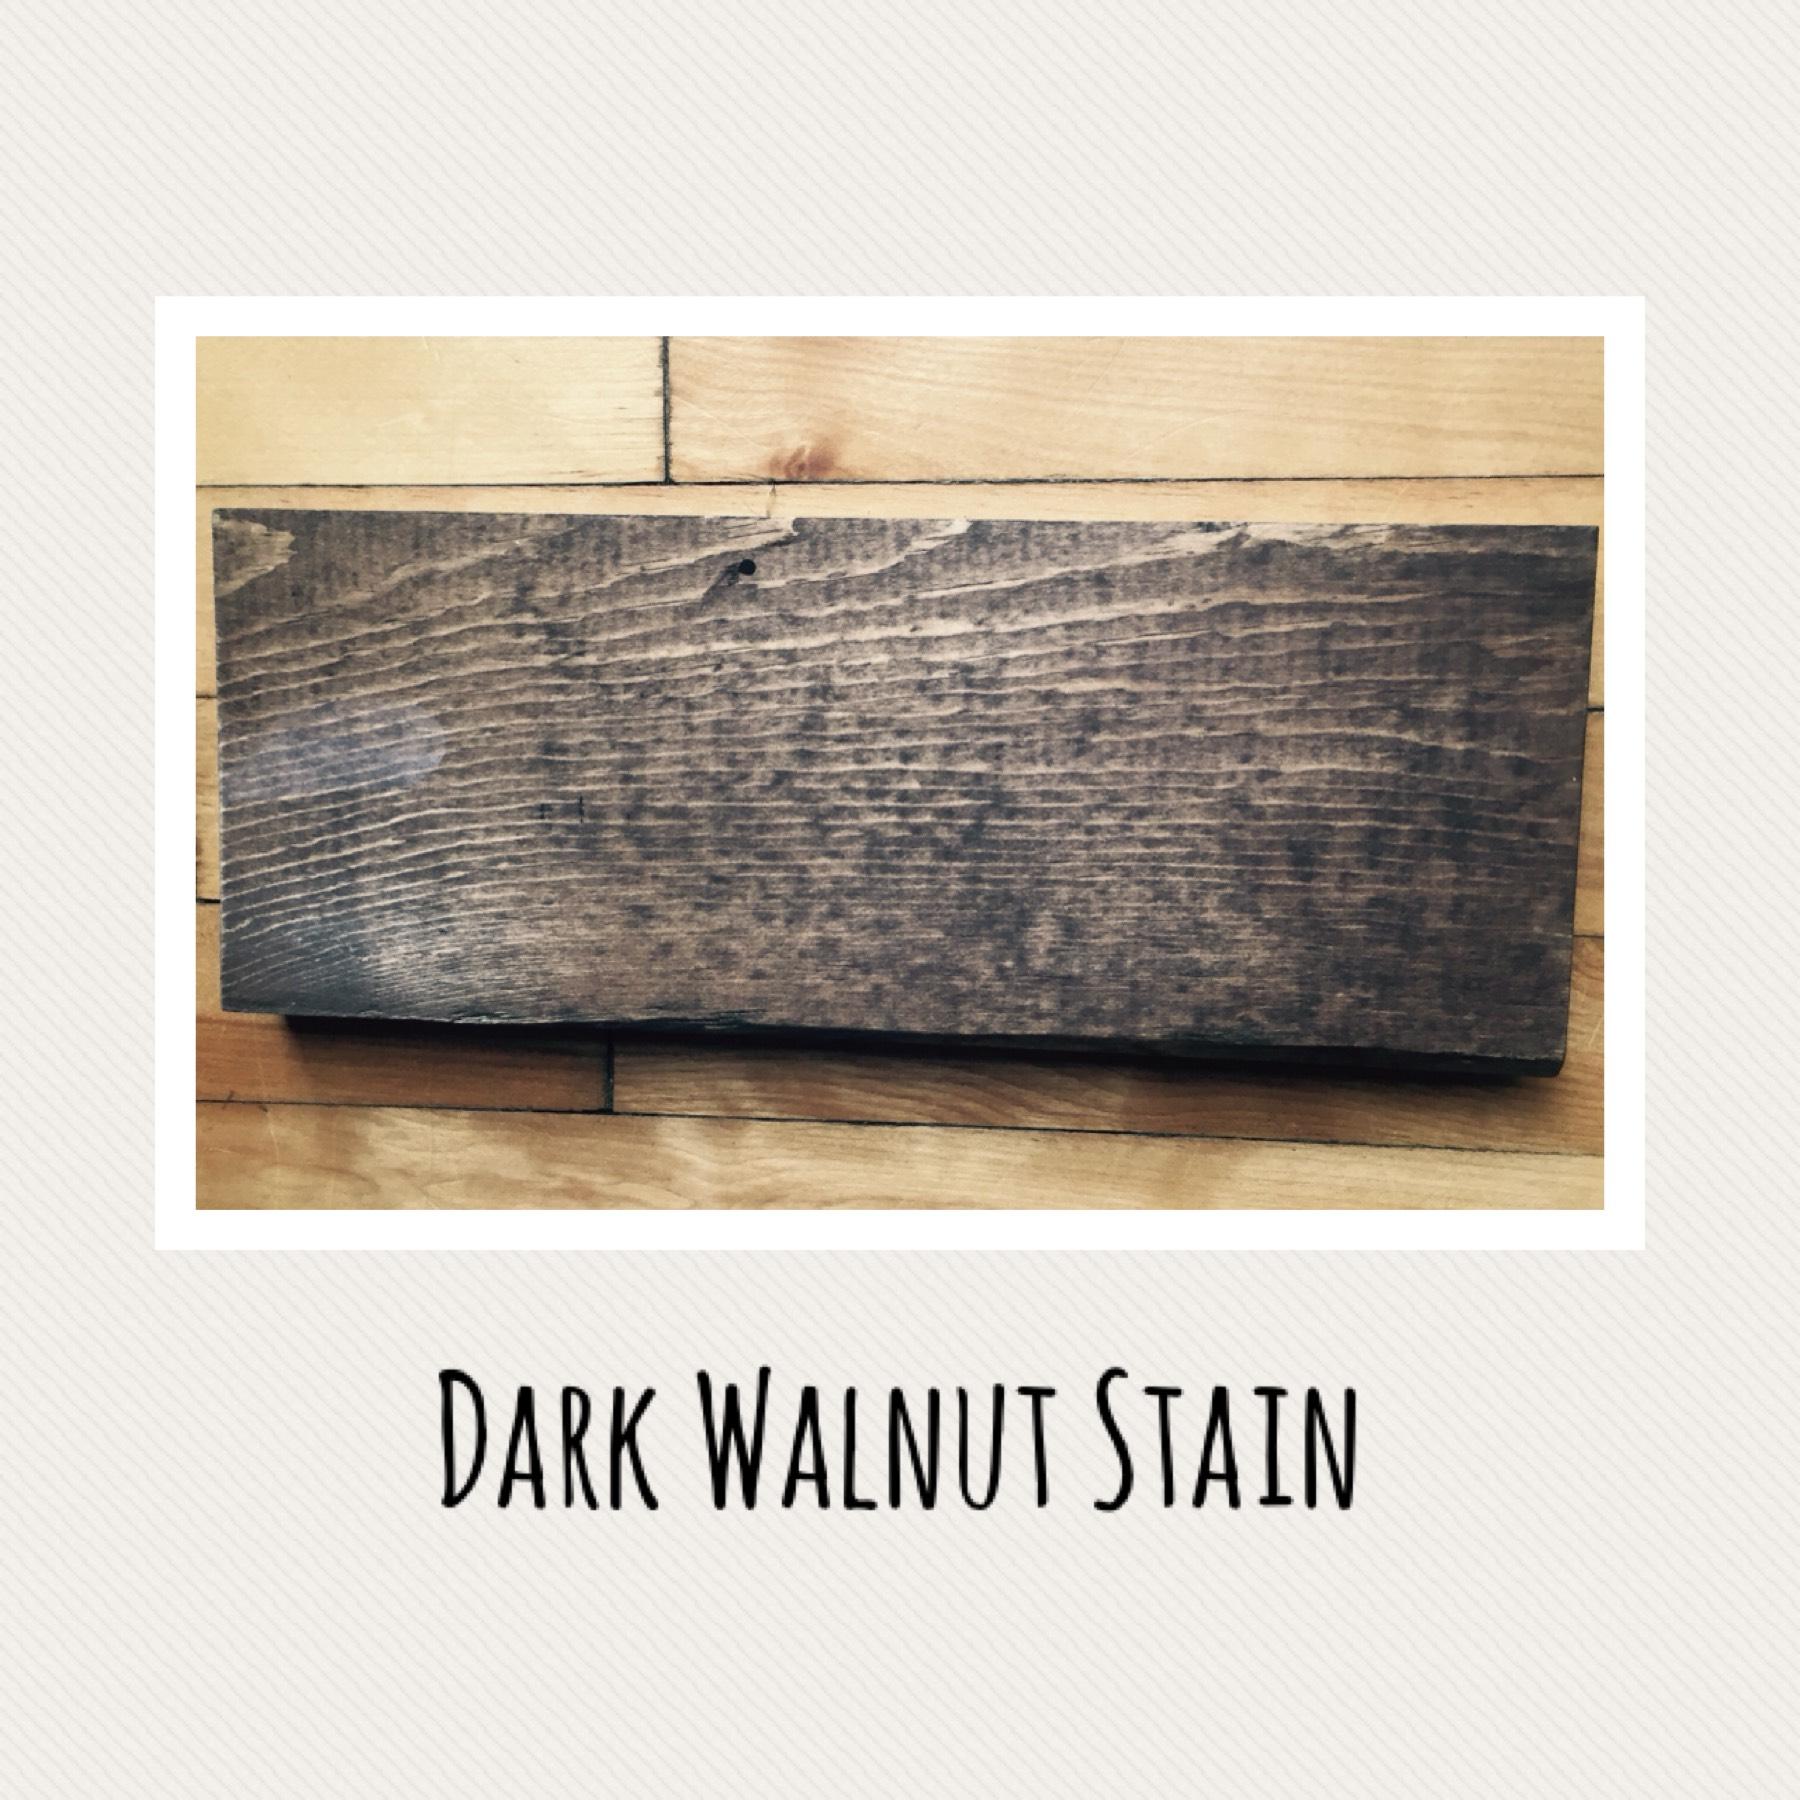 DIY Wood Pallet Sign Kits